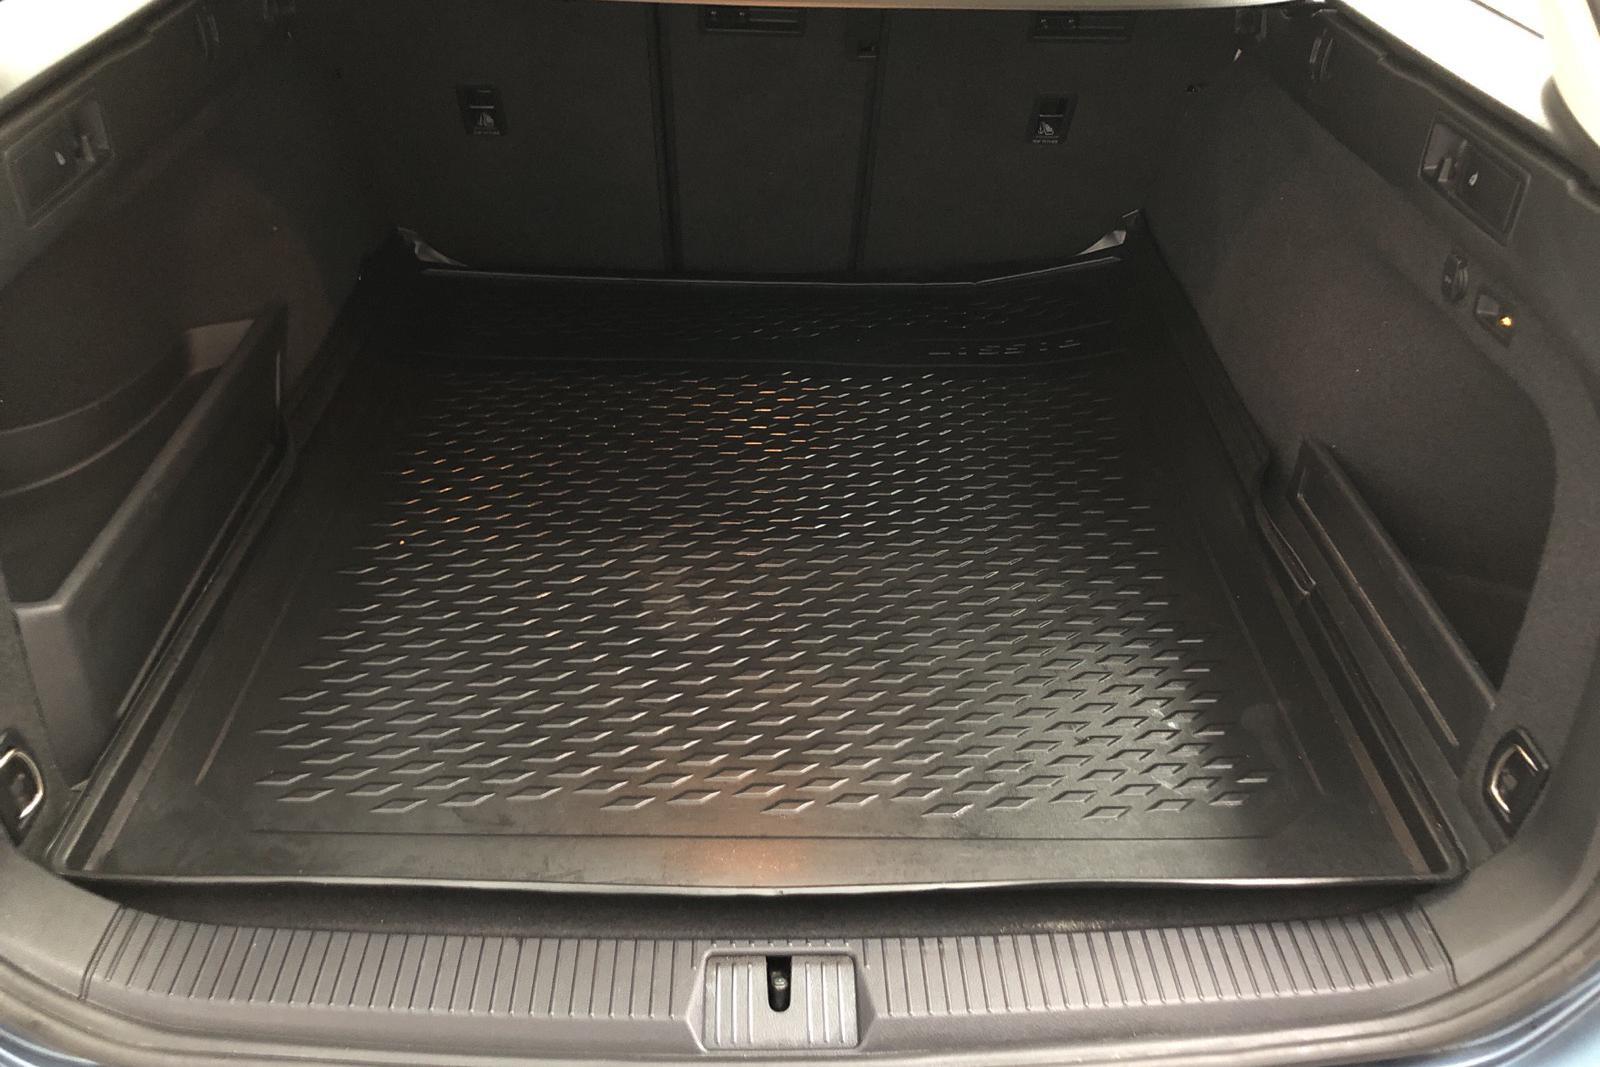 VW Passat 1.4 Plug-in-Hybrid Sportscombi (218hk) - 12 100 mil - Automat - blå - 2018